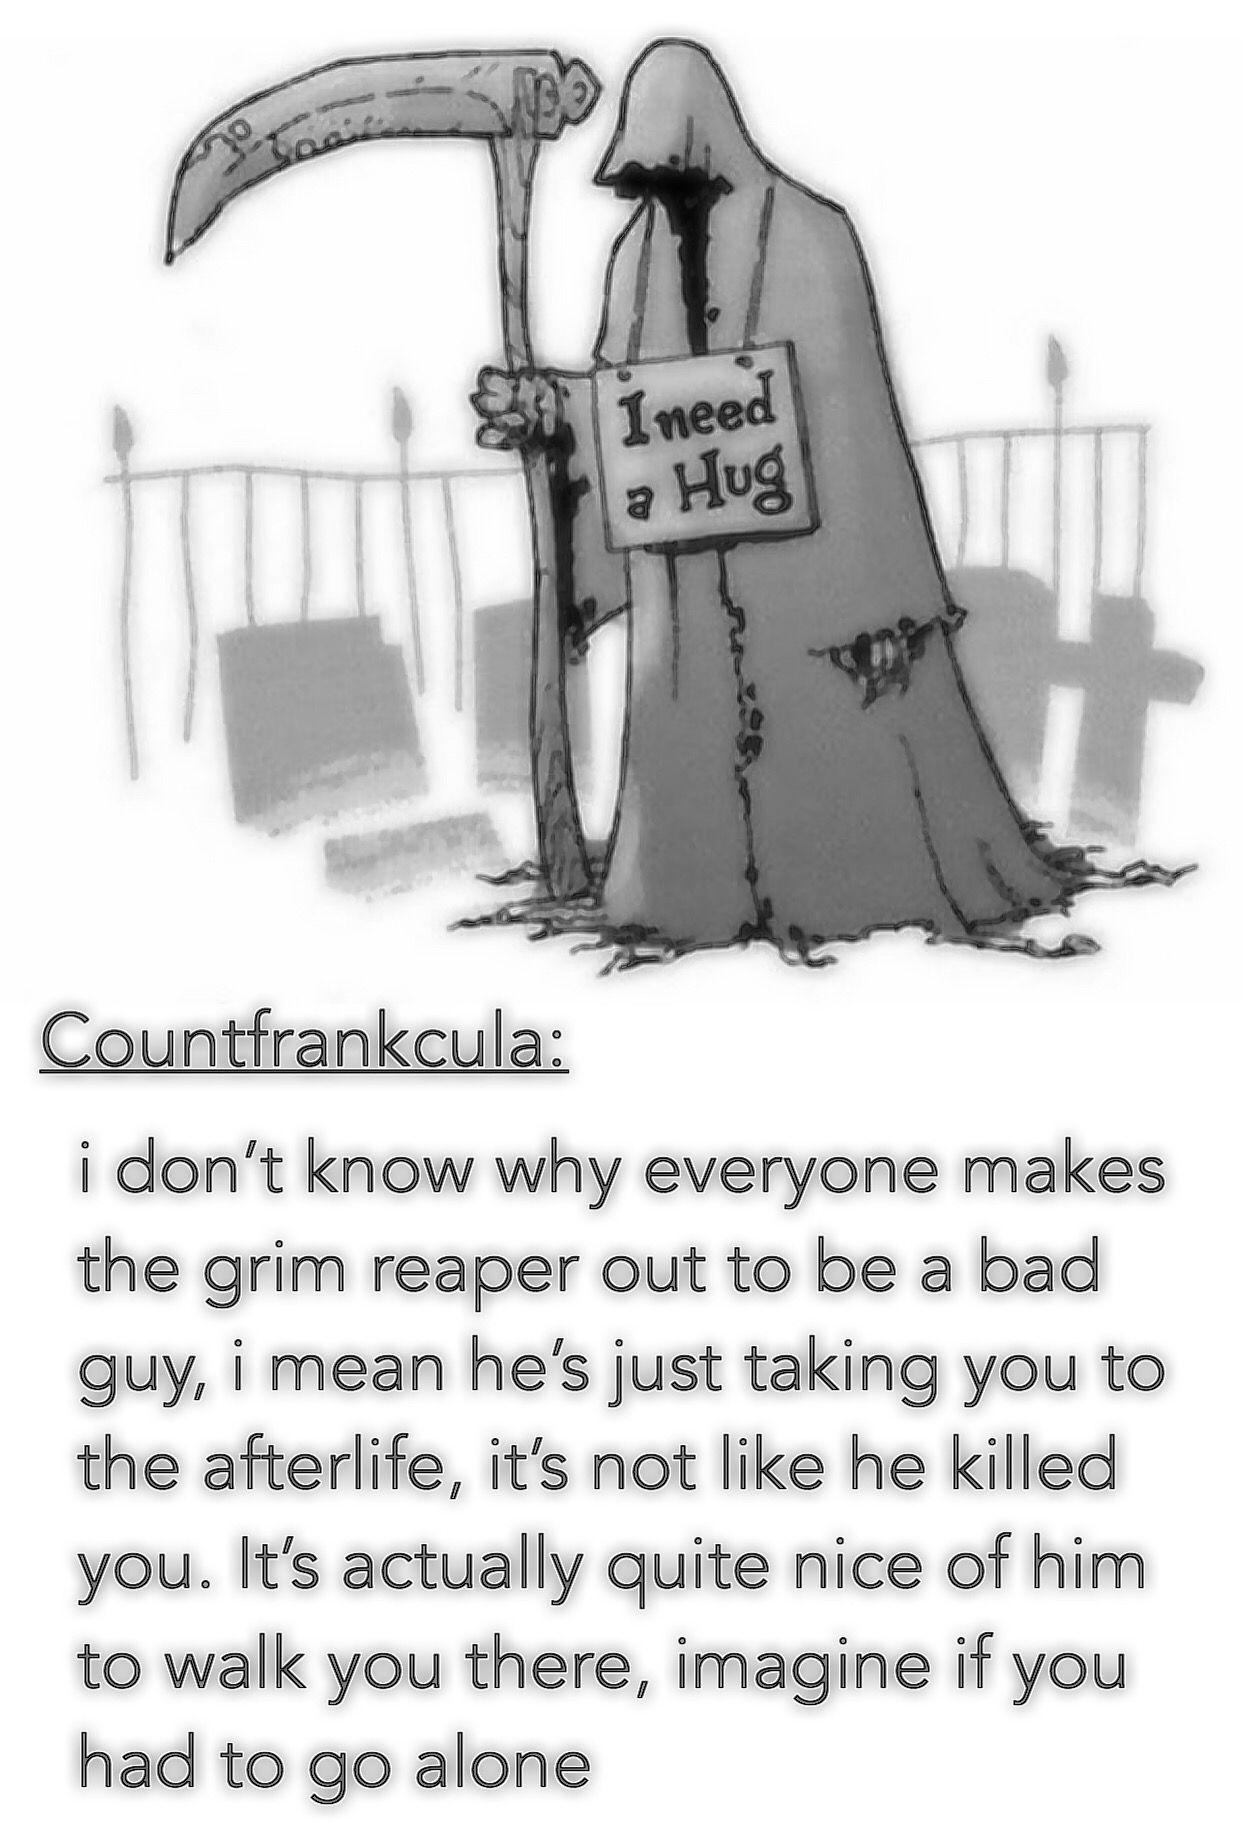 Pin by Clau Dia on Random | Grim reaper, Guys, Memes